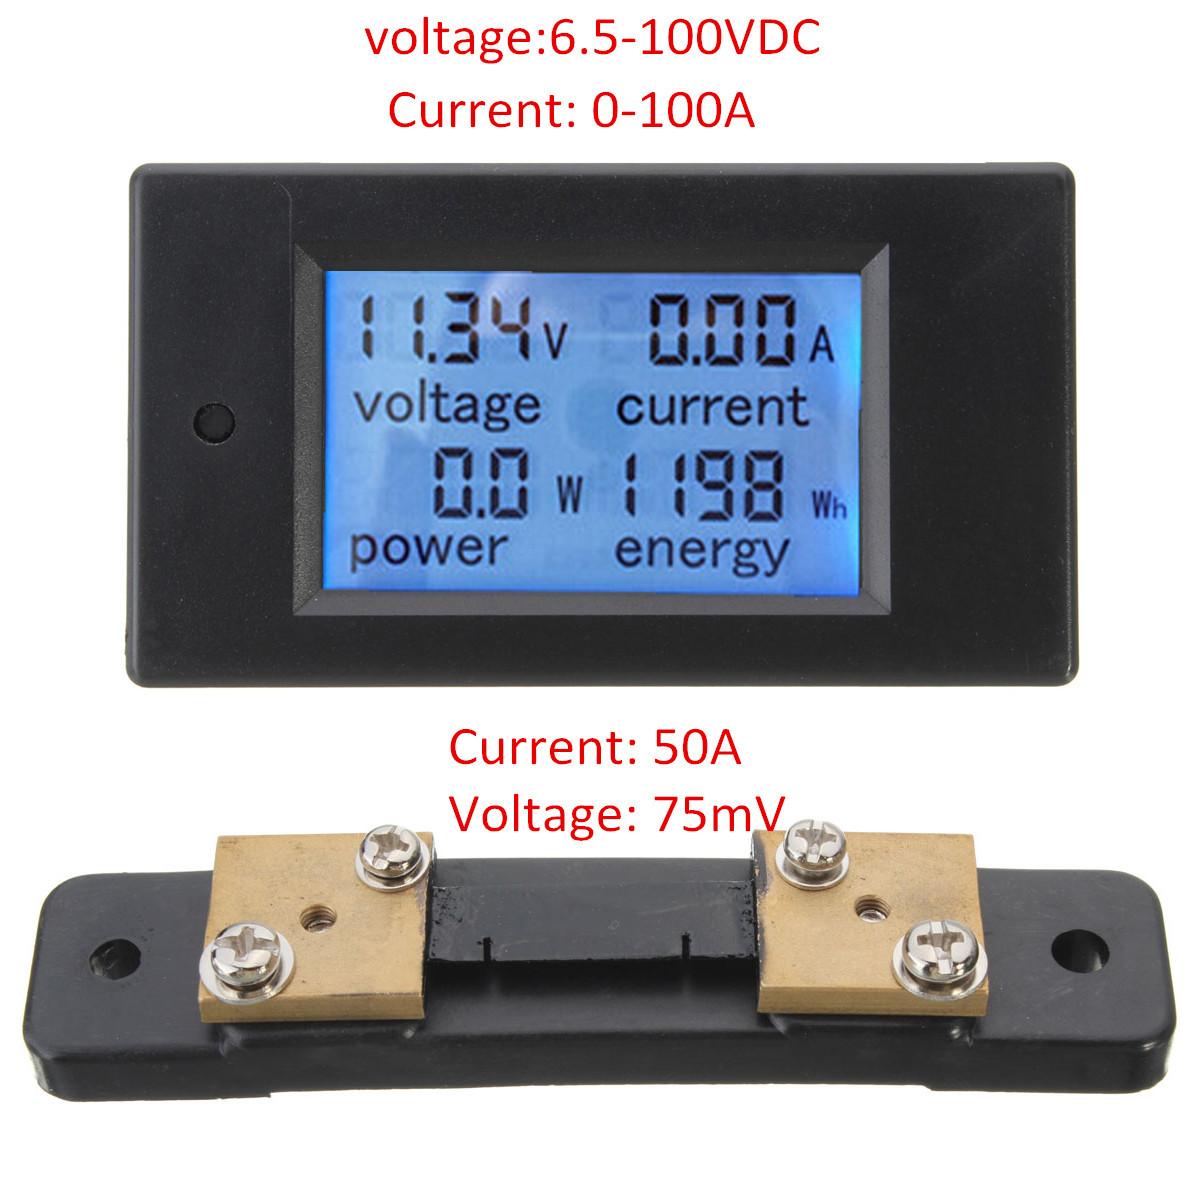 Excellway power meter